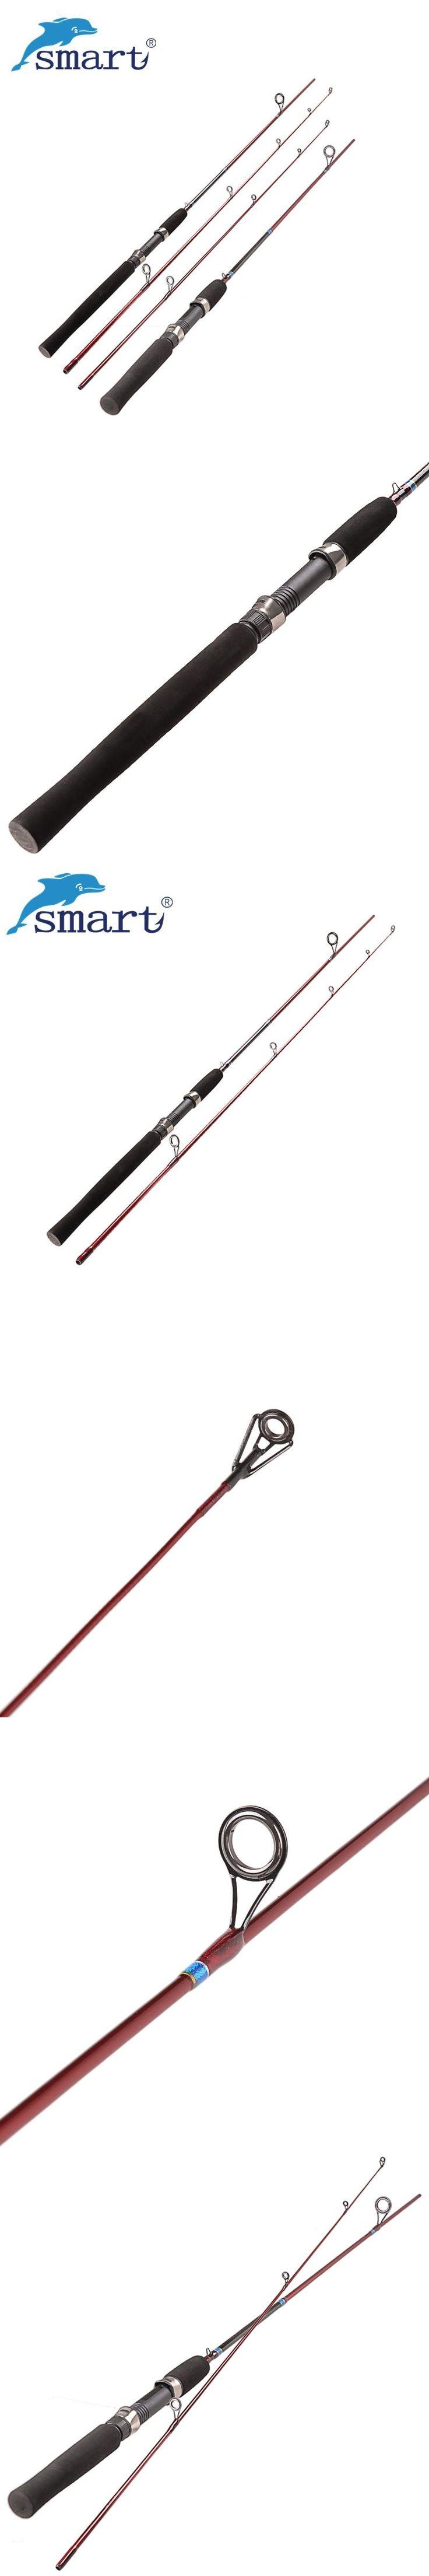 Smart 2Section Fishing Rod 1.68m/1.8m Carbon M/L Carp Fish Stand Pole Vara Cana De Pesca Spinning Rod Guide Peche #fishingrod